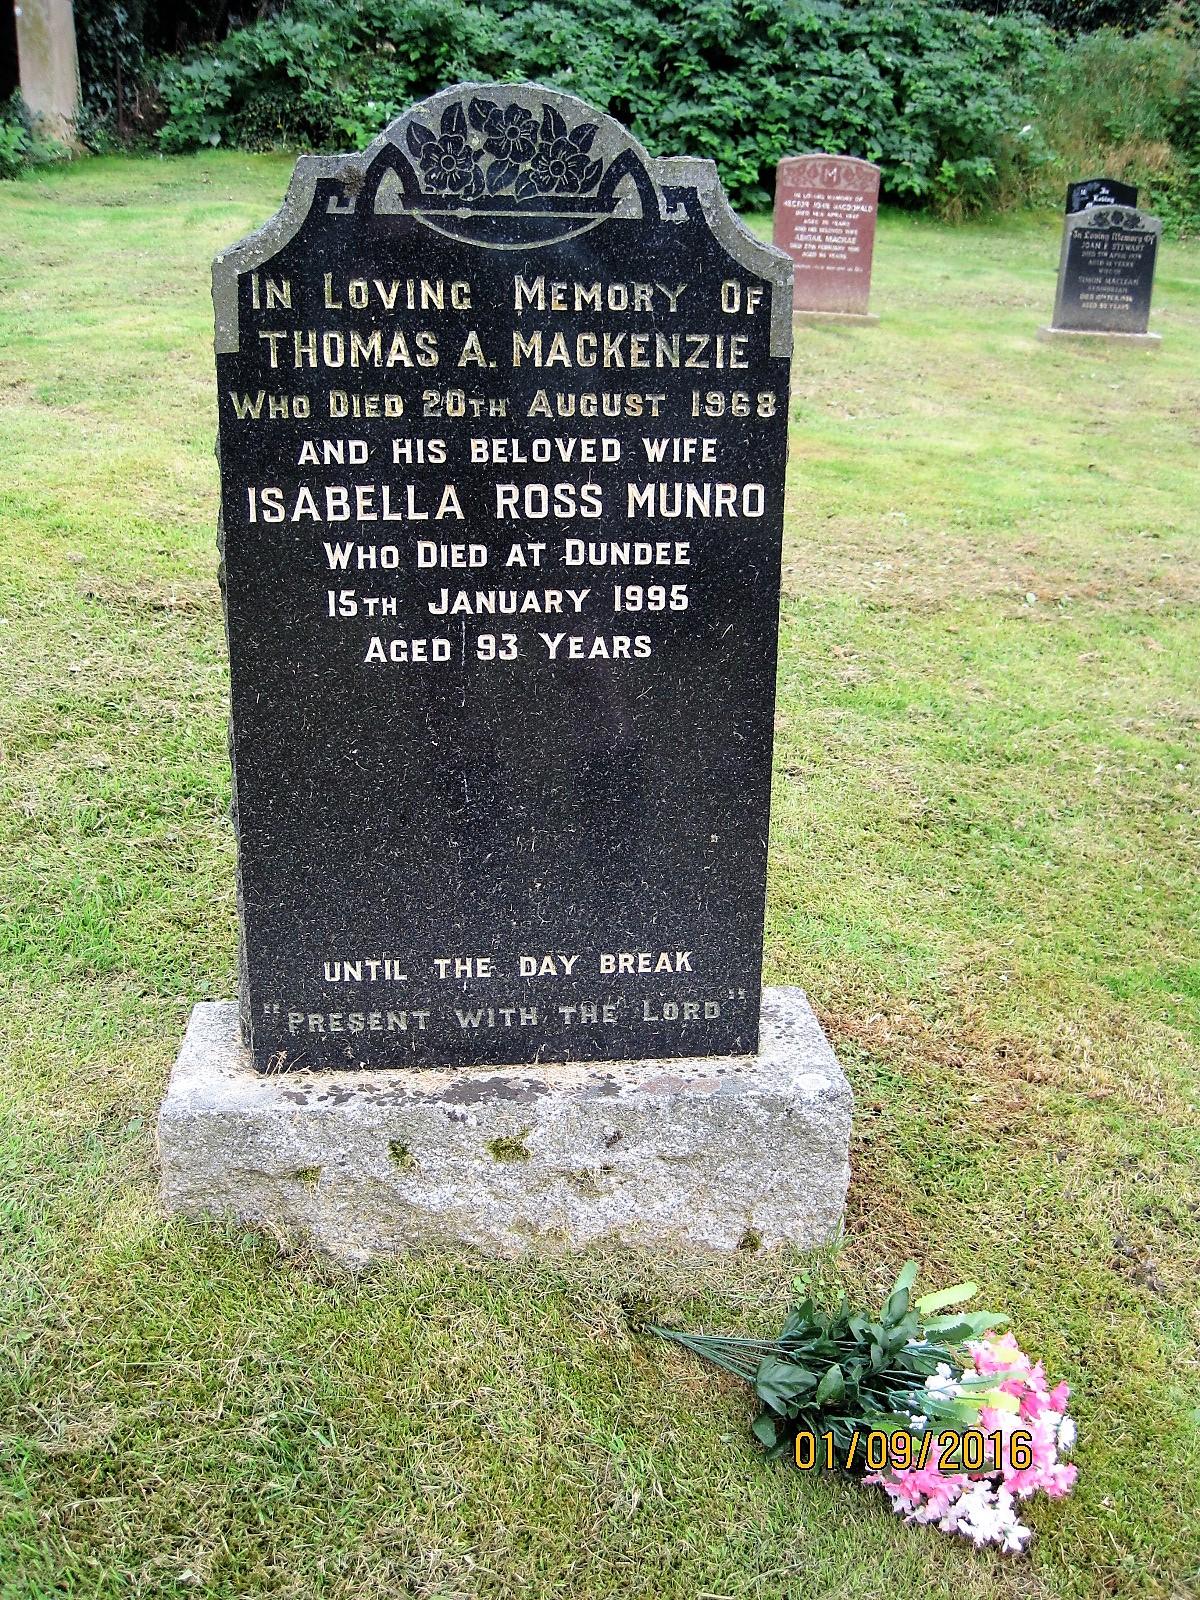 Thomas A Mackenzie 1988